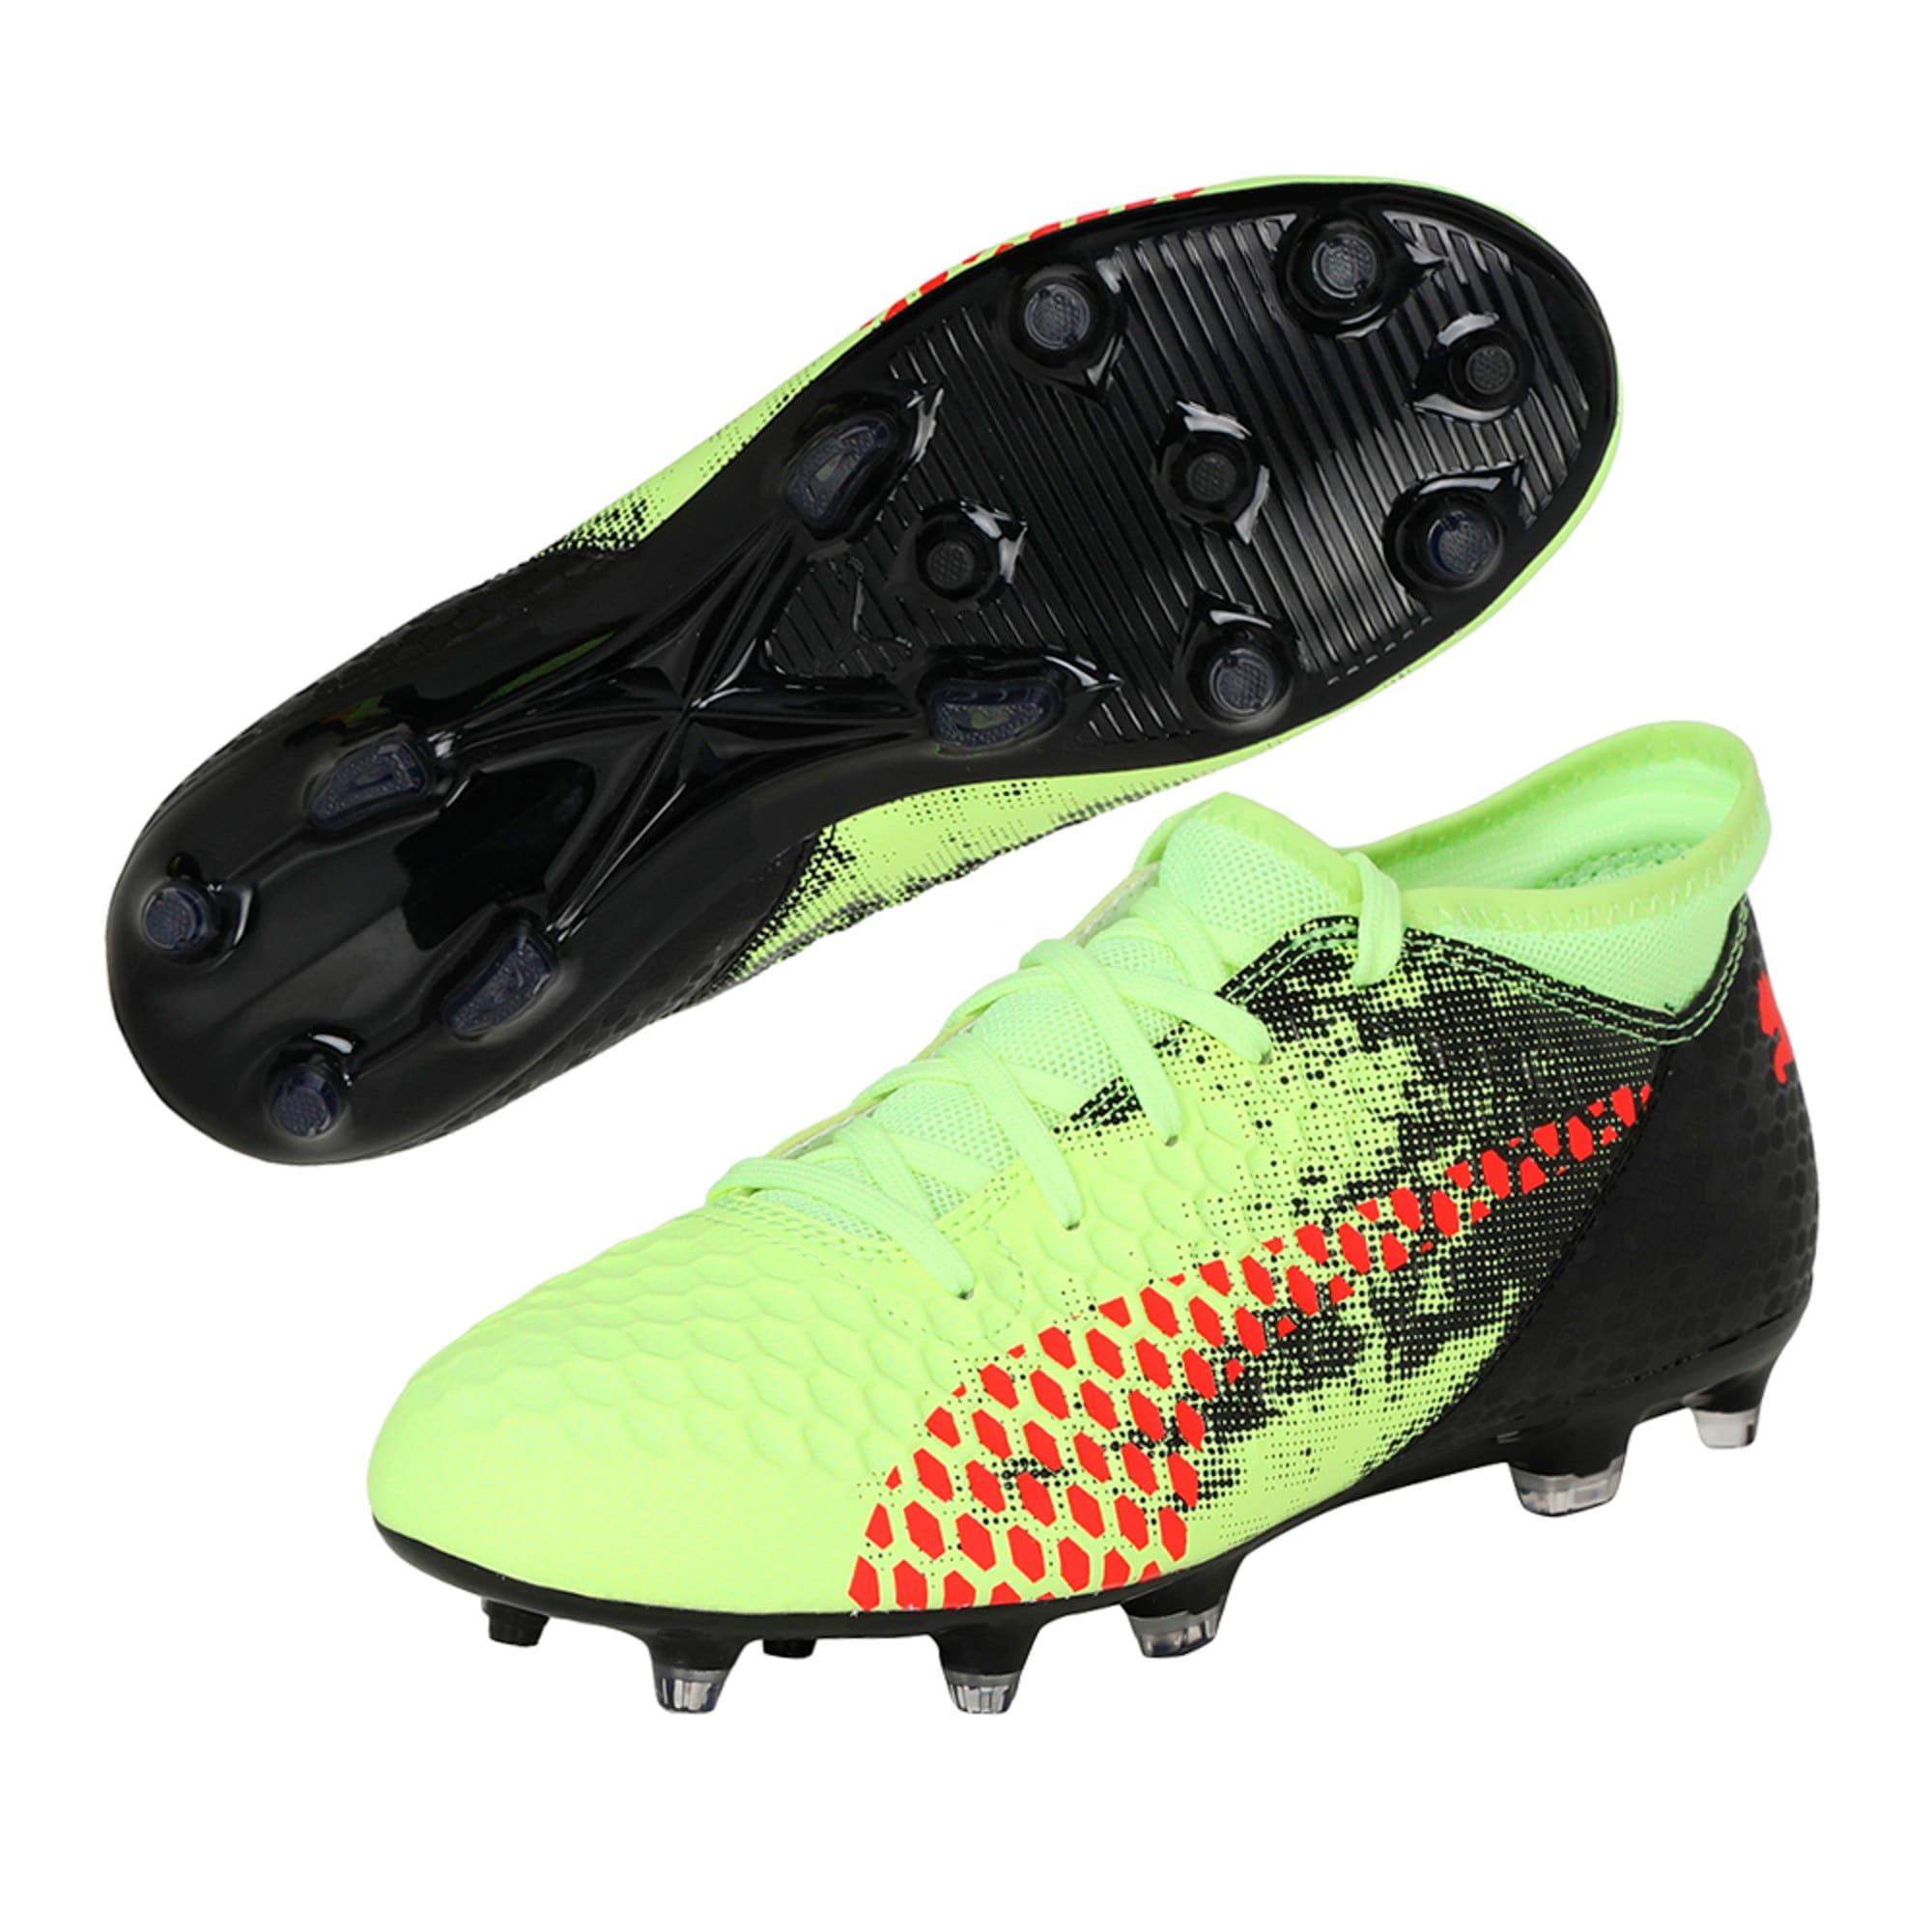 Thumbnail 6 of FUTURE 18.4 FG/AG Jr Football Boots, Yellow-Red-Black, medium-IND